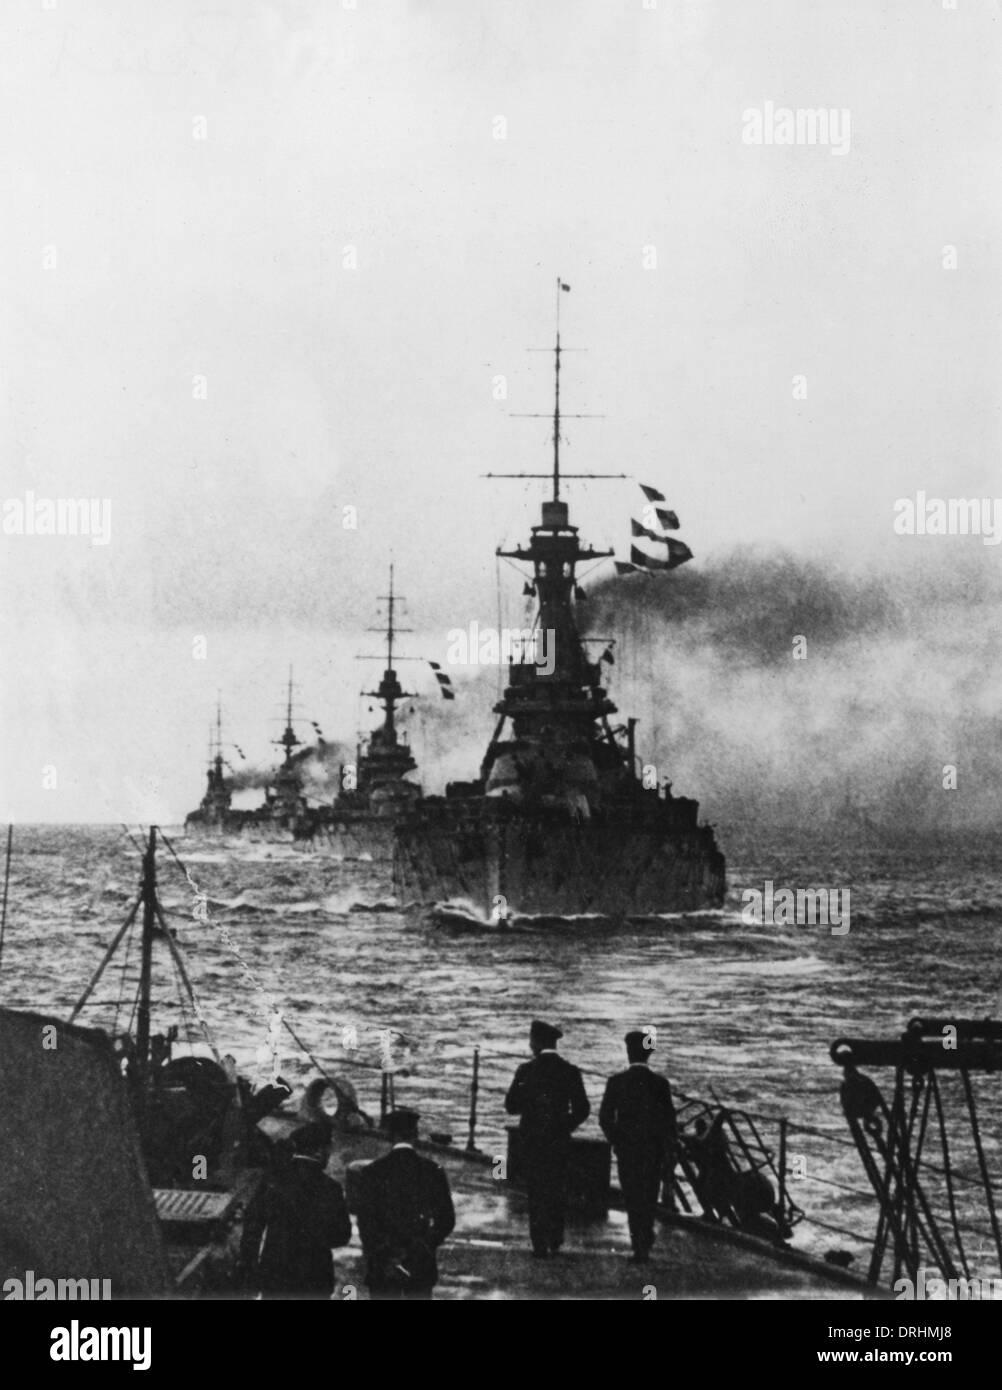 Ships of the British Grand Fleet, WW1 - Stock Image